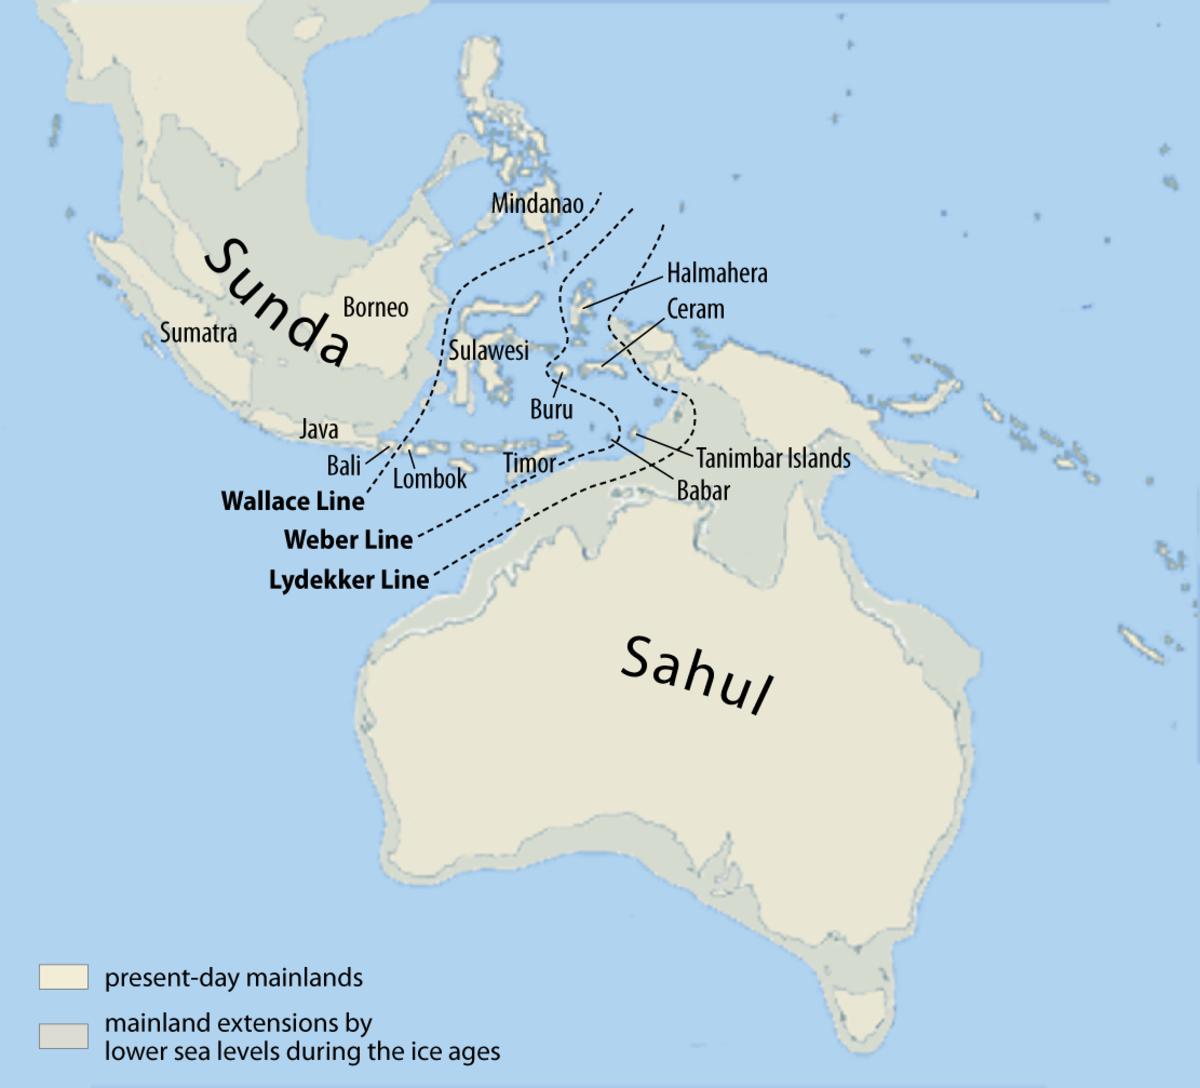 The submerged continent of Sunda